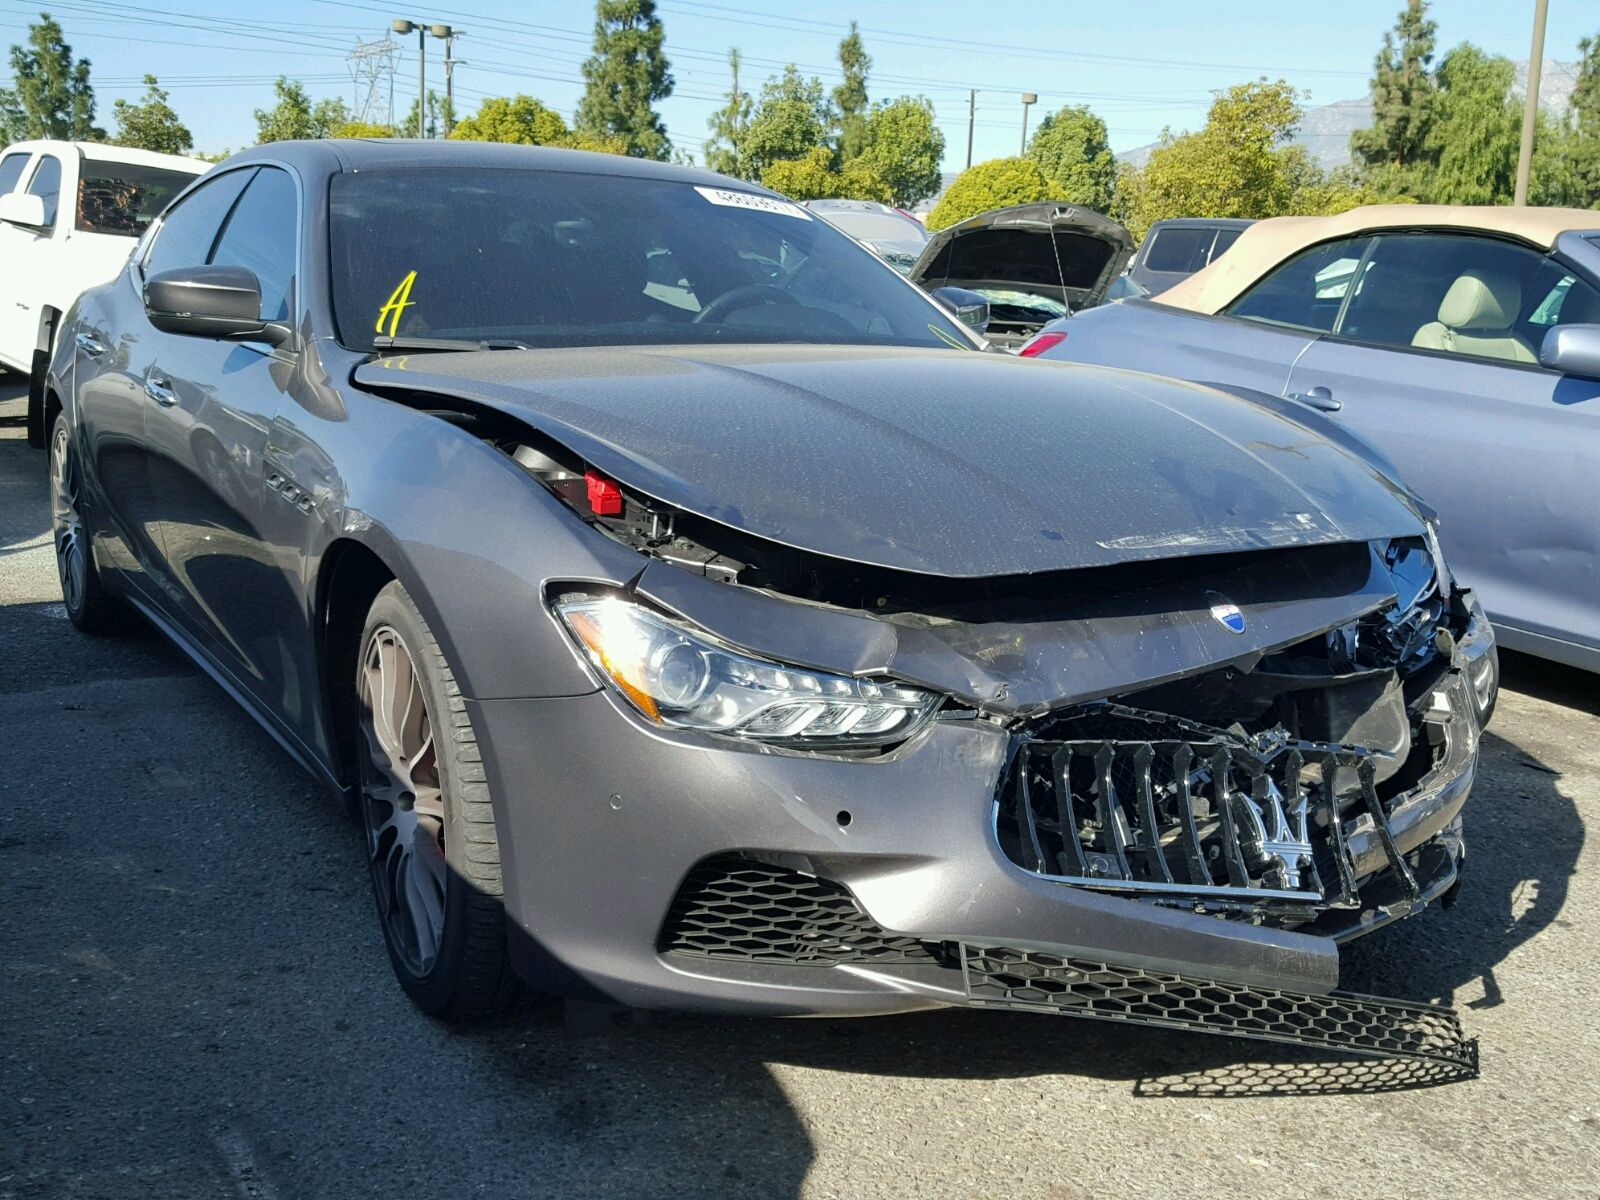 Salvage 2017 Maserati Ghibli   Wrecked Exotics   Pinterest